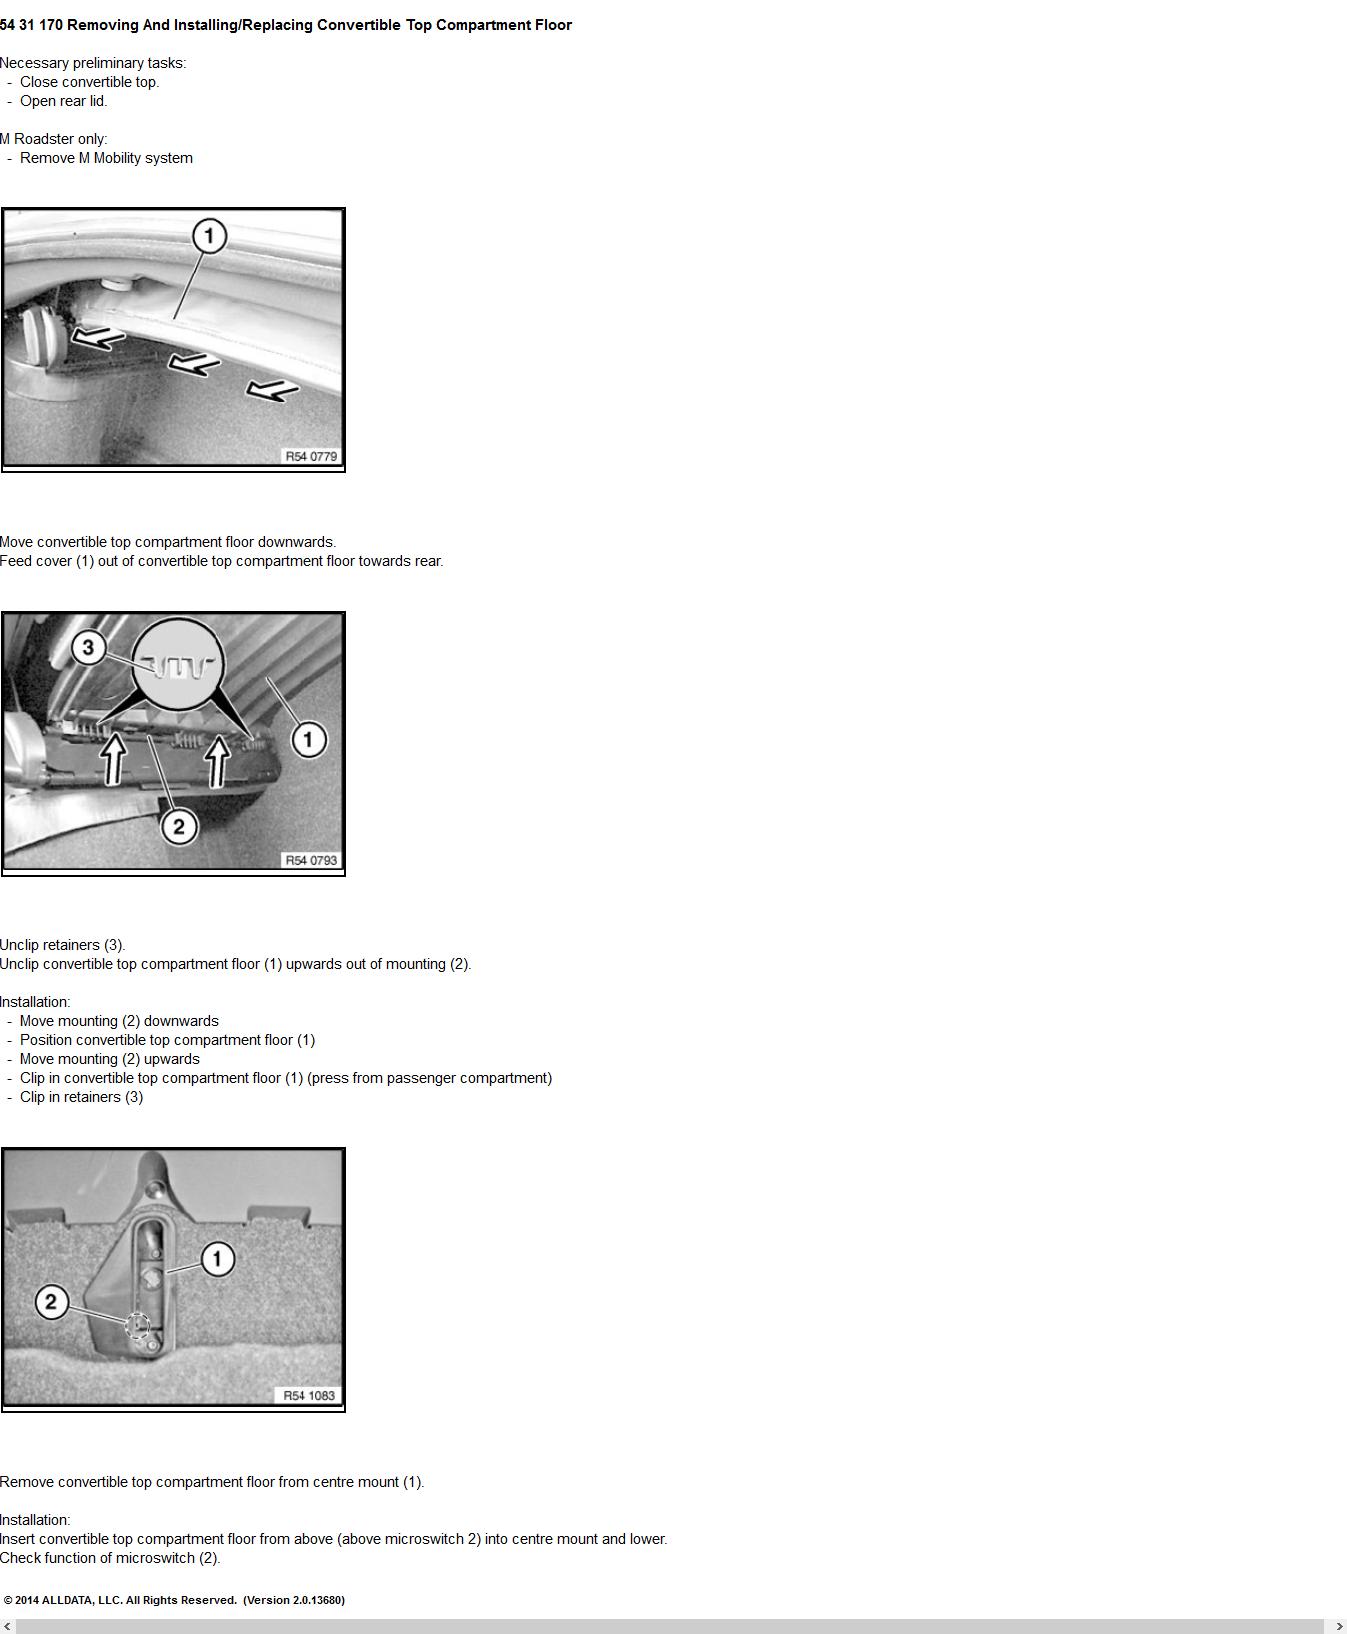 Bmw Z4 Problems: How To Install Rear Shocks On A 2003 Bmw Z4 Convertible